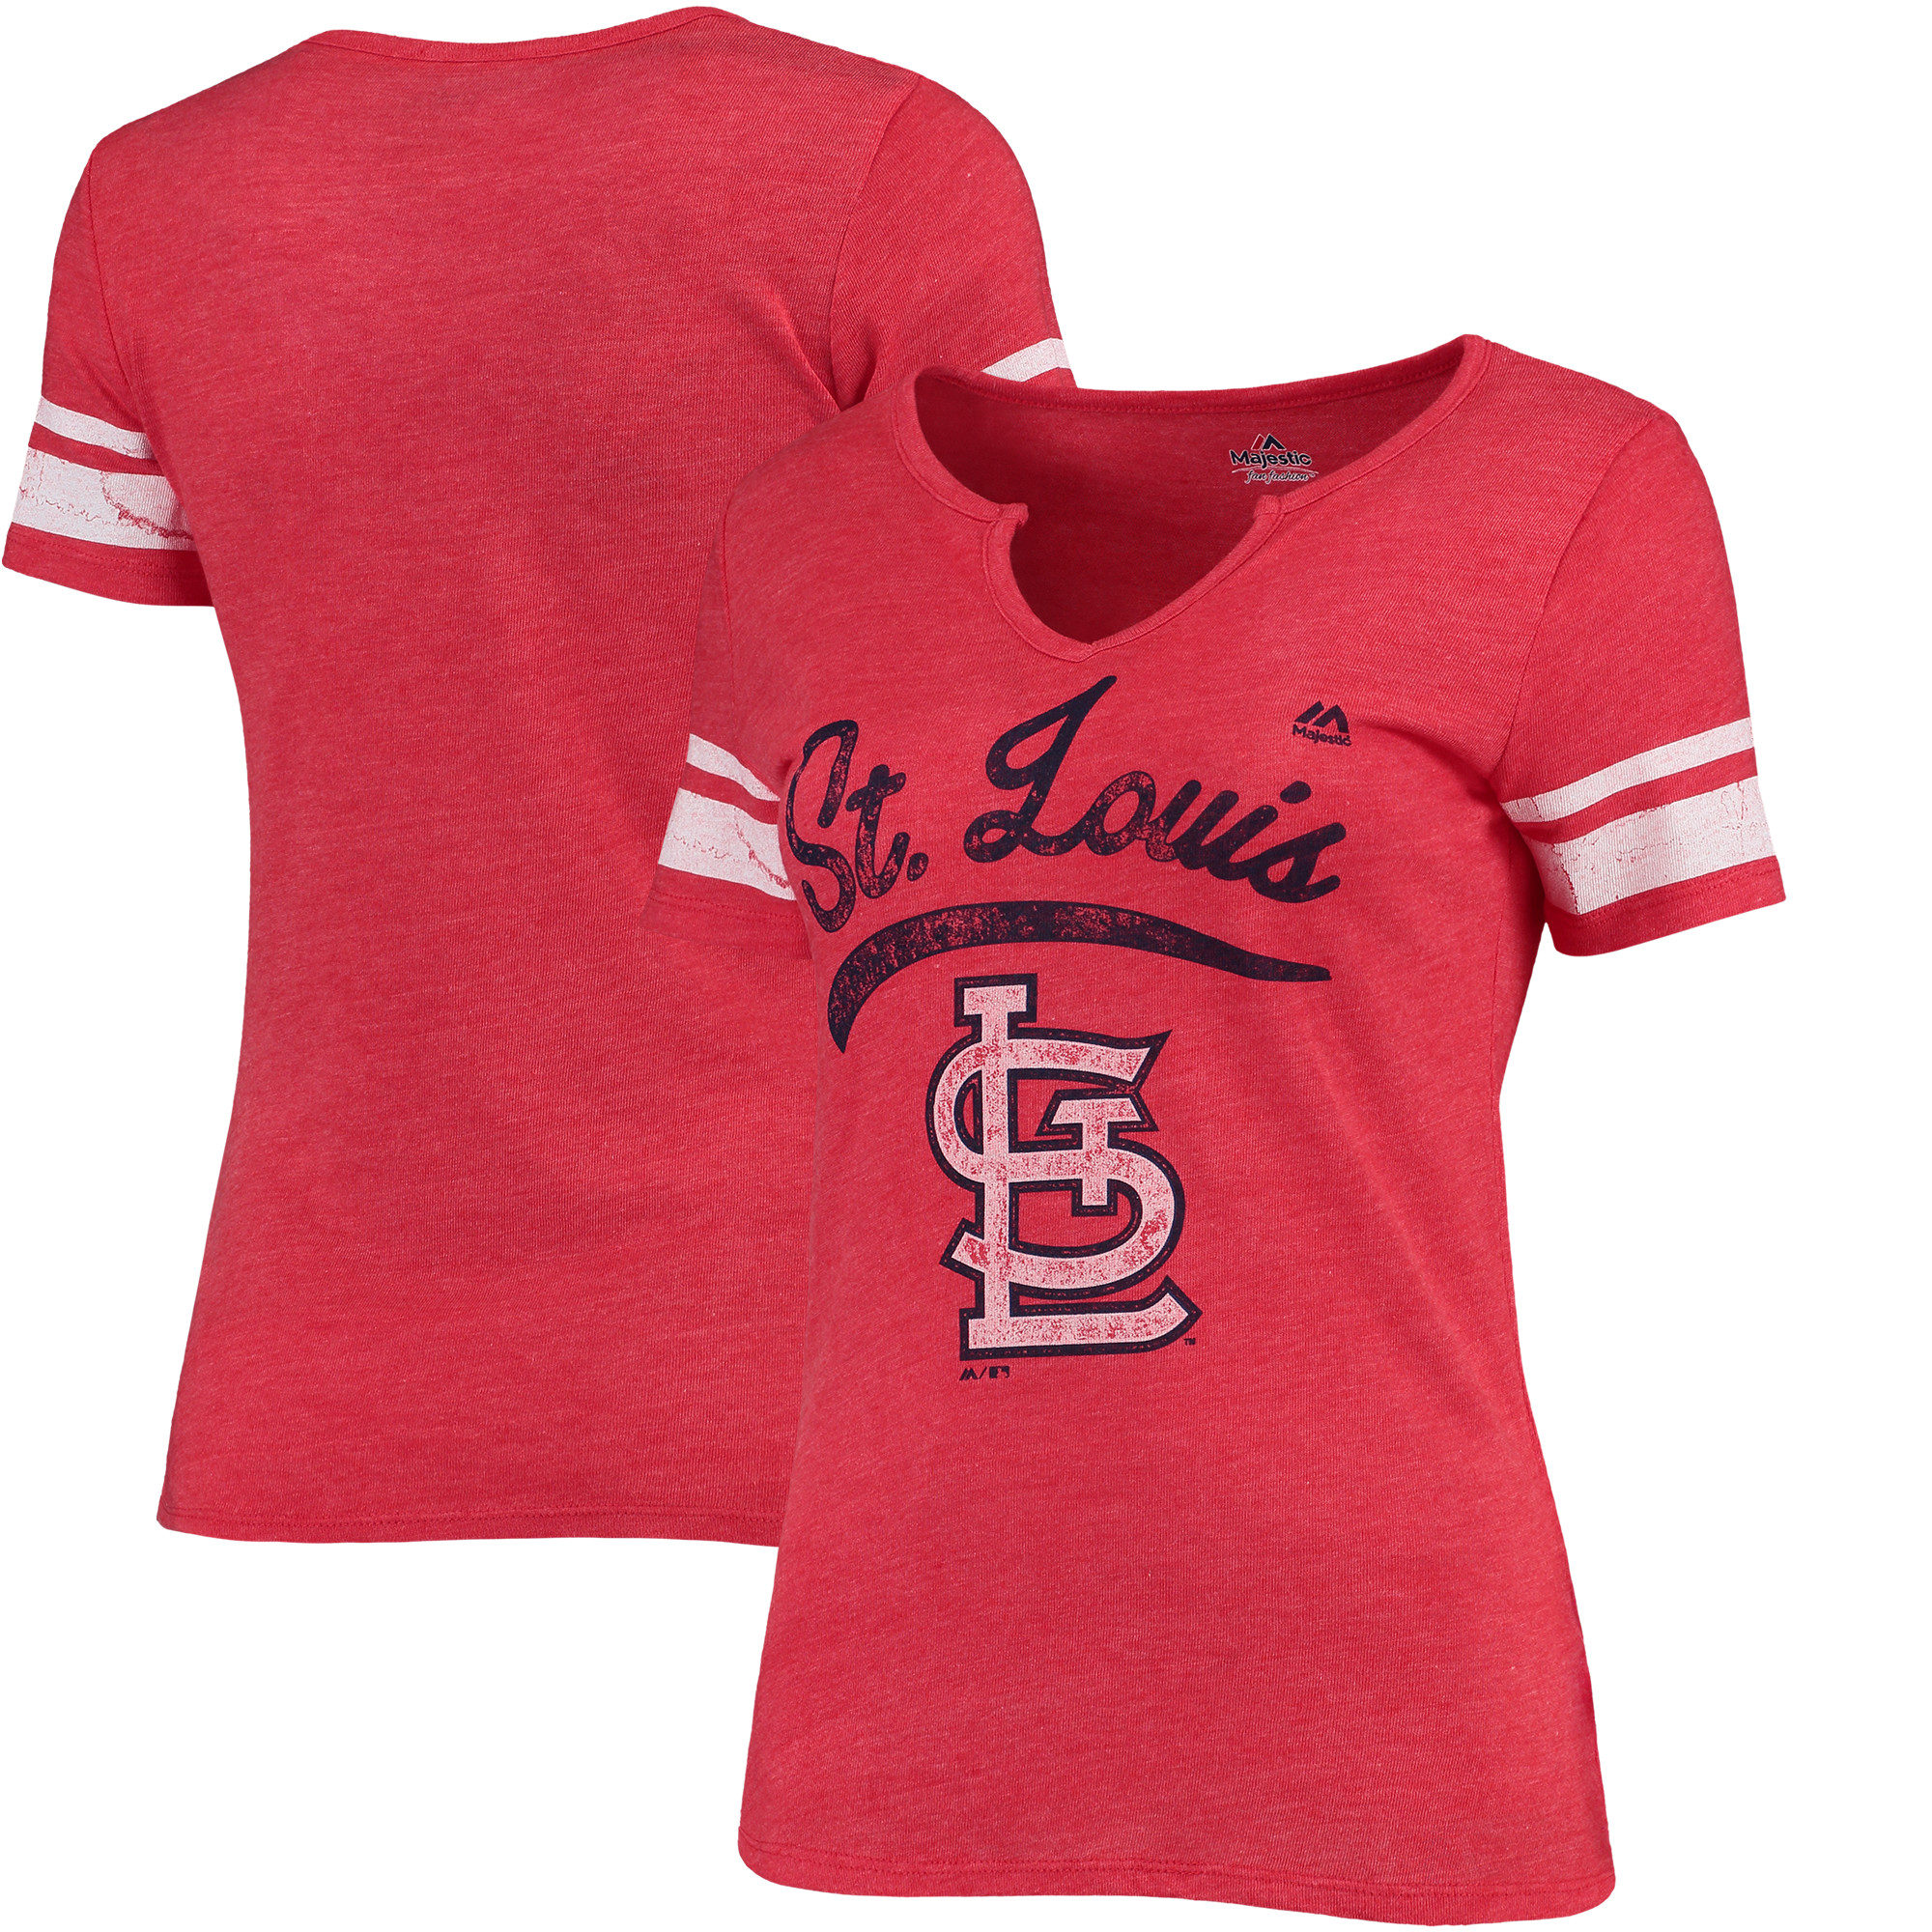 St. Louis Cardinals Majestic Women's Spirit Awareness V-Neck T-Shirt - Heather Red